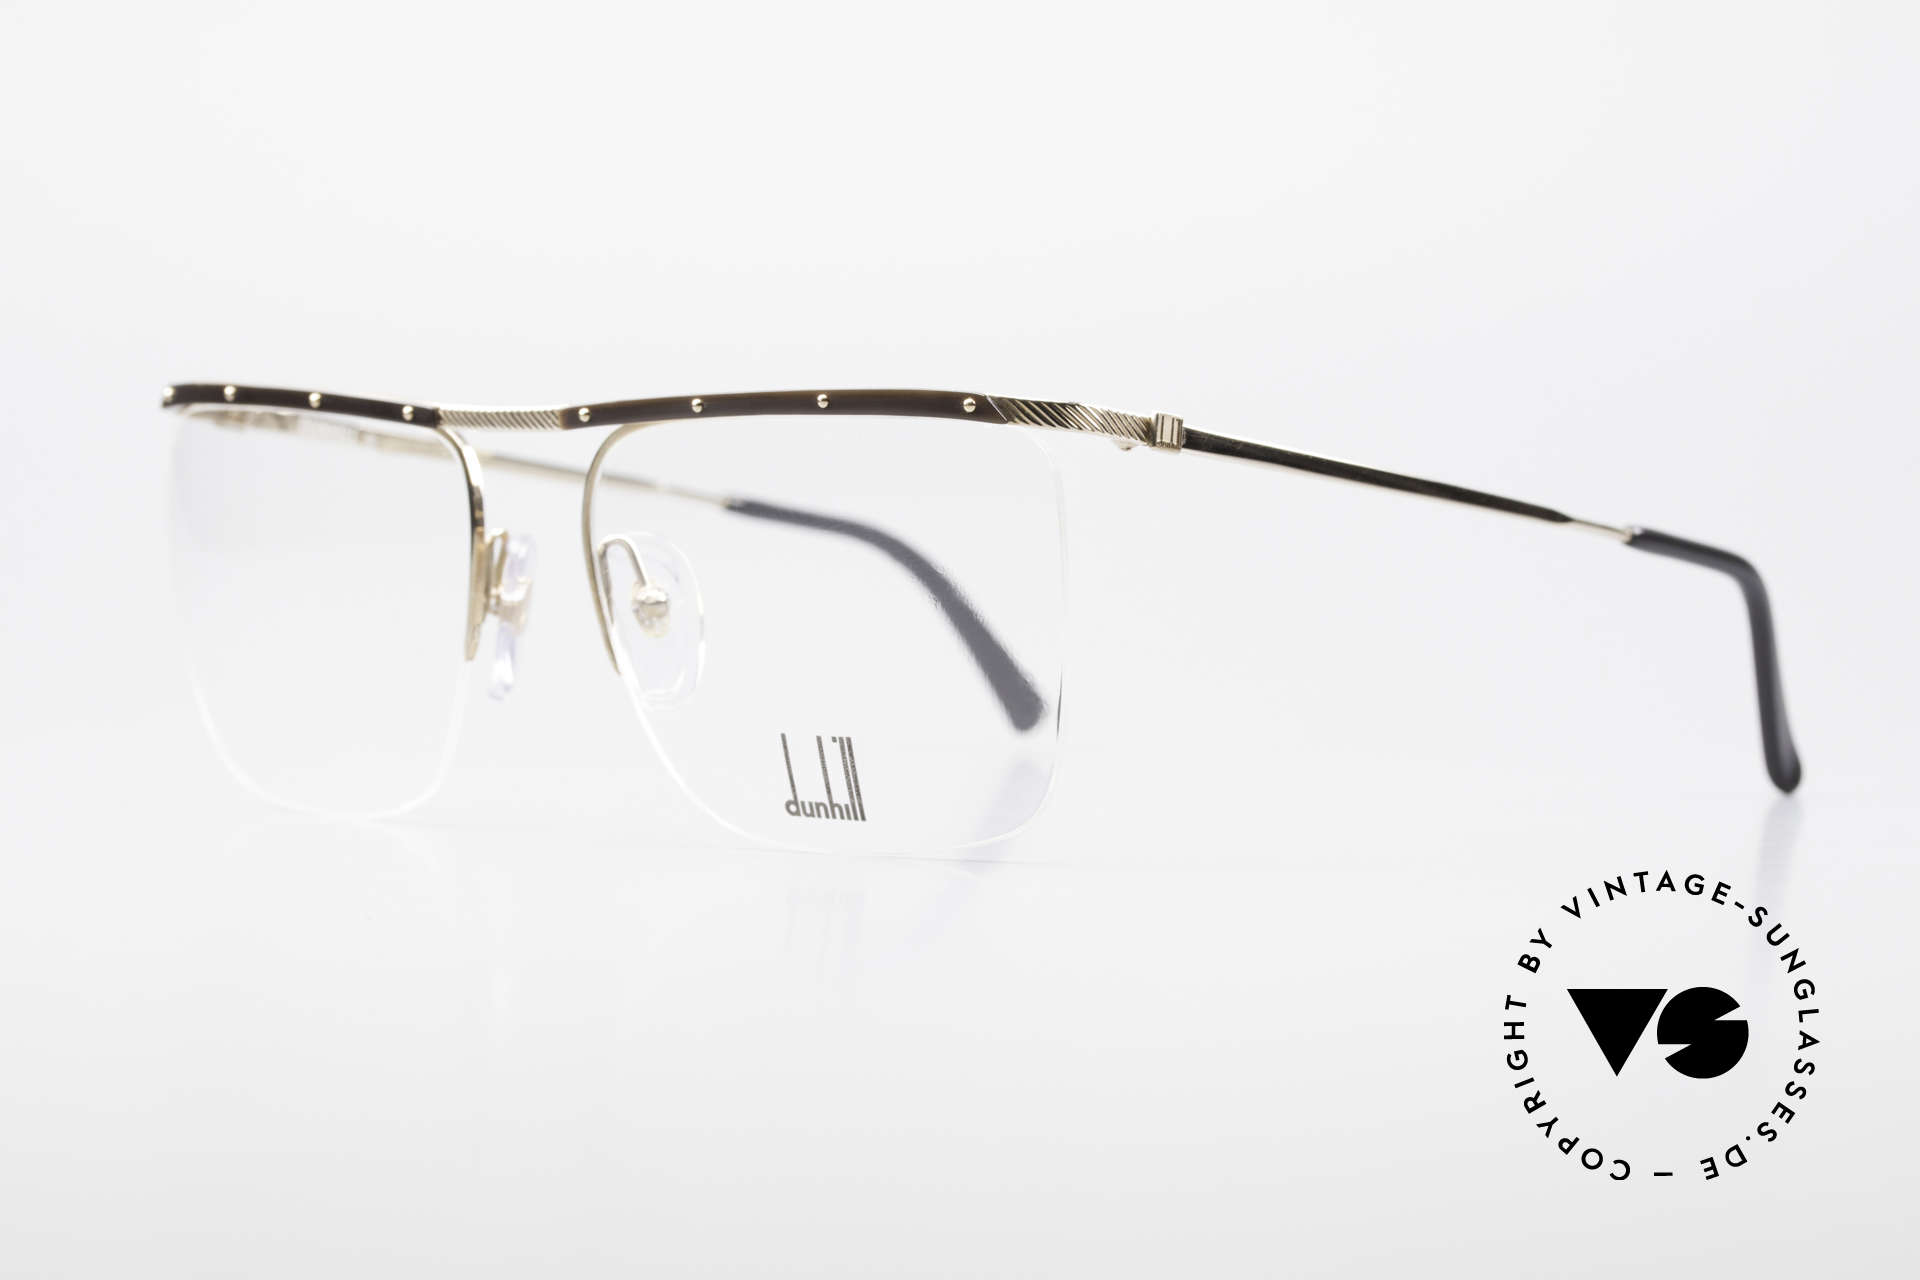 Dunhill 6056 80's Genuine Horn Trims Frame, timeless, stylish design (real gentleman specs), Made for Men